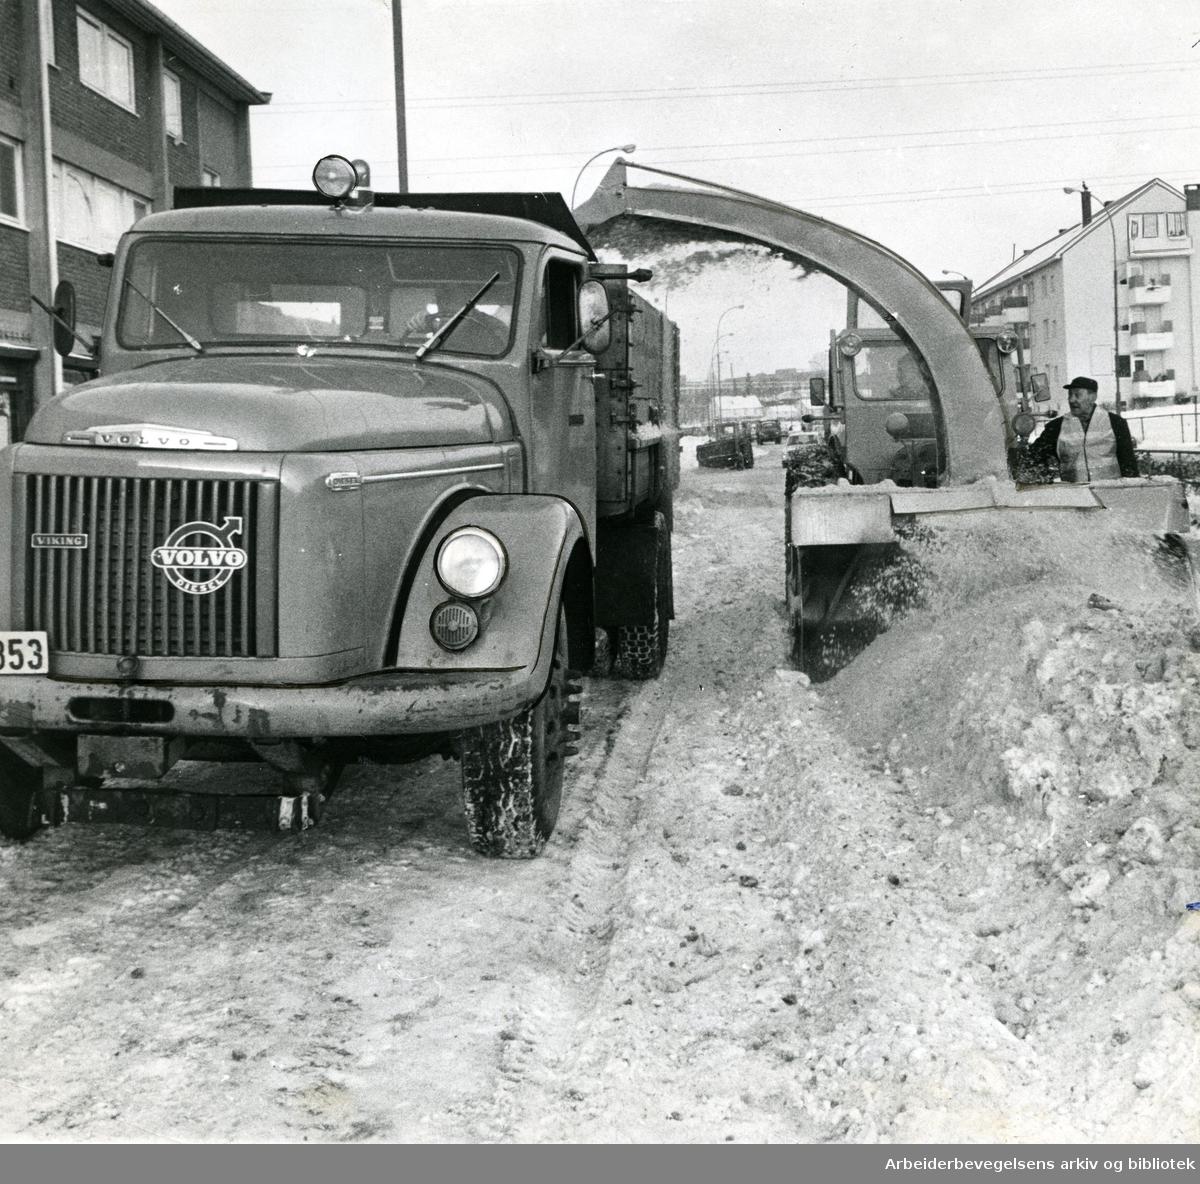 Oslo veivesen rydder snø,.januar 1967